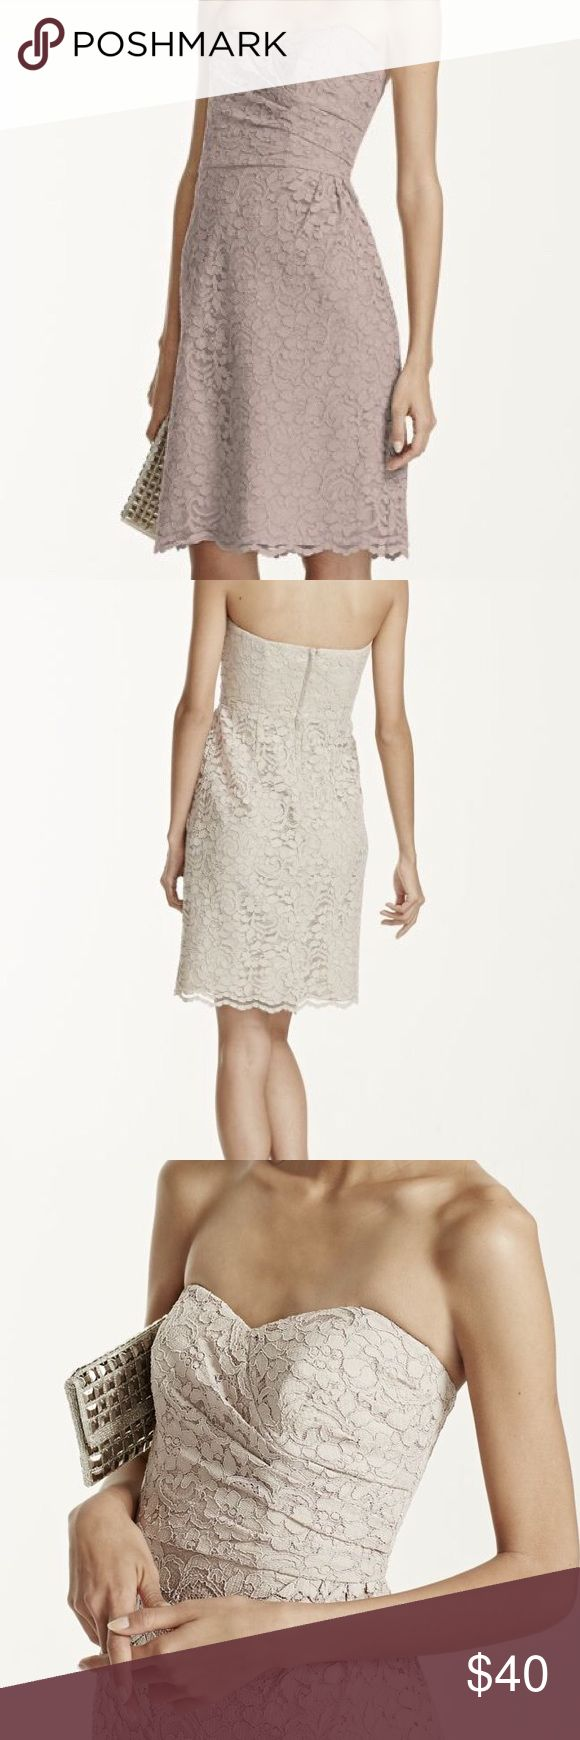 Best 25 davids bridal bridesmaid dresses ideas only on pinterest davids bridal bridesmaid dress ombrellifo Images